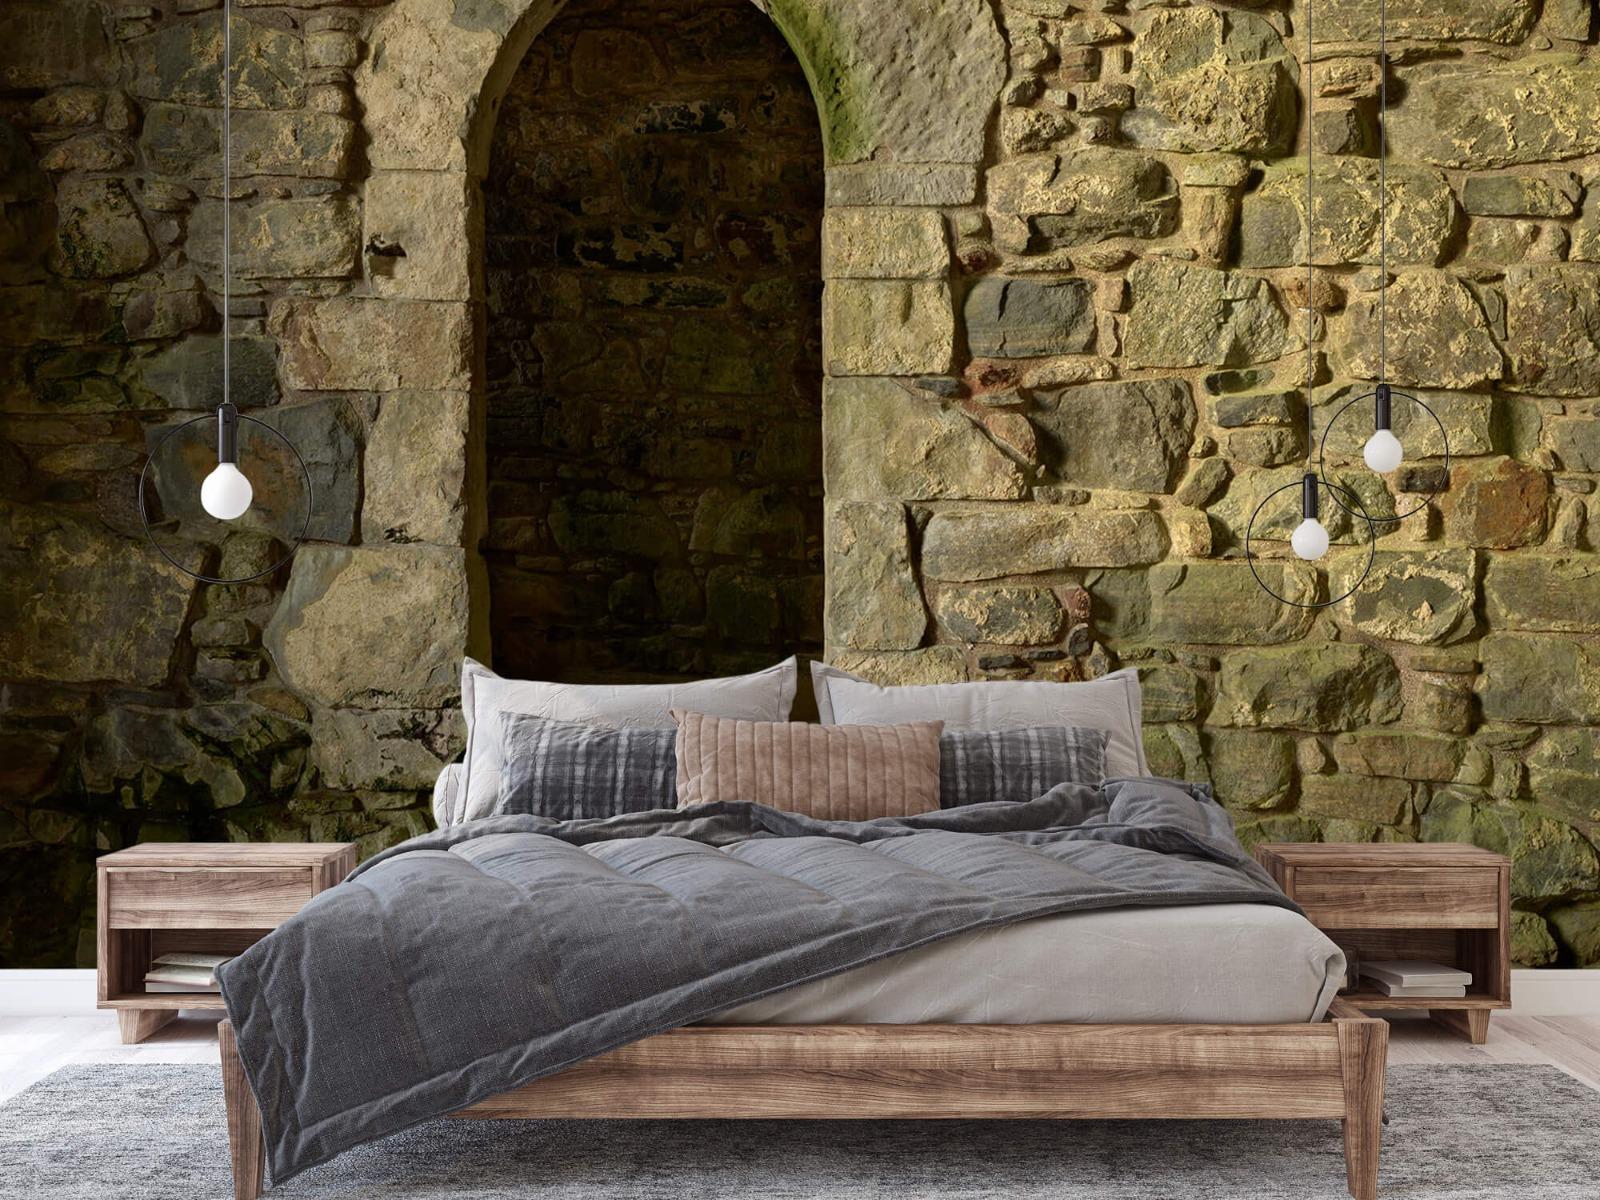 Steen behang - Oude muur met doorgang - Slaapkamer 2